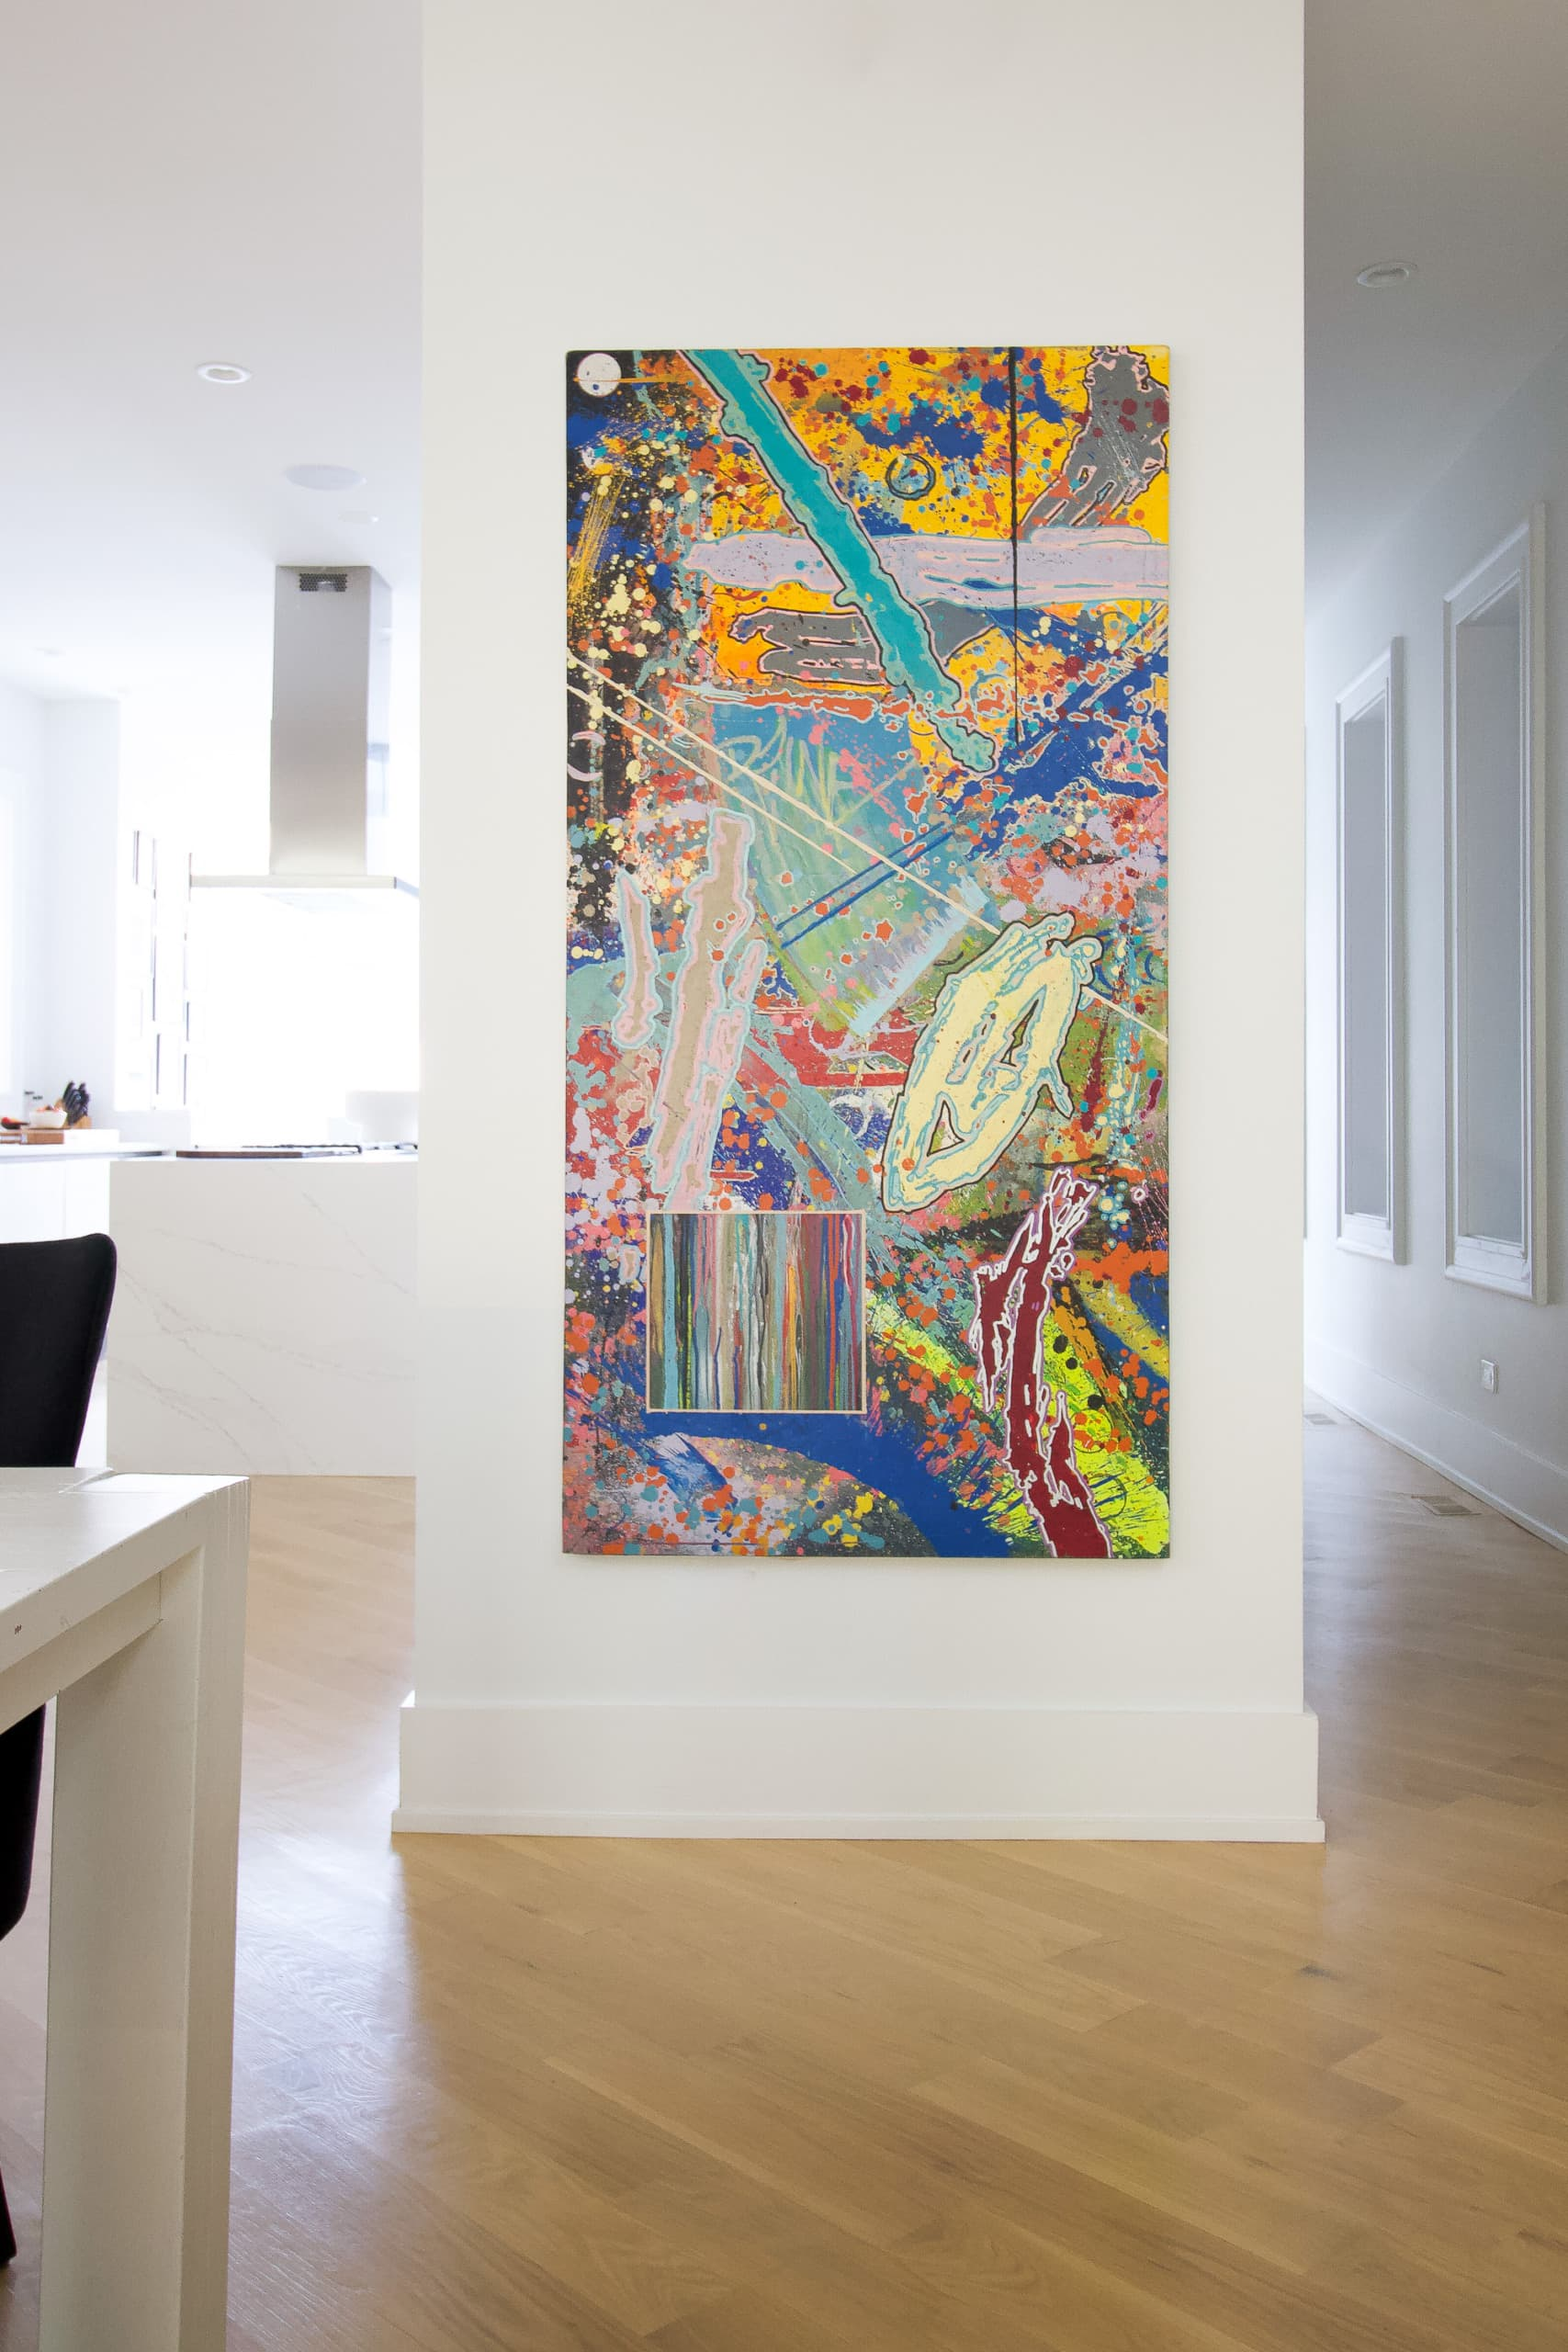 Gorgeous art in this modern home tour